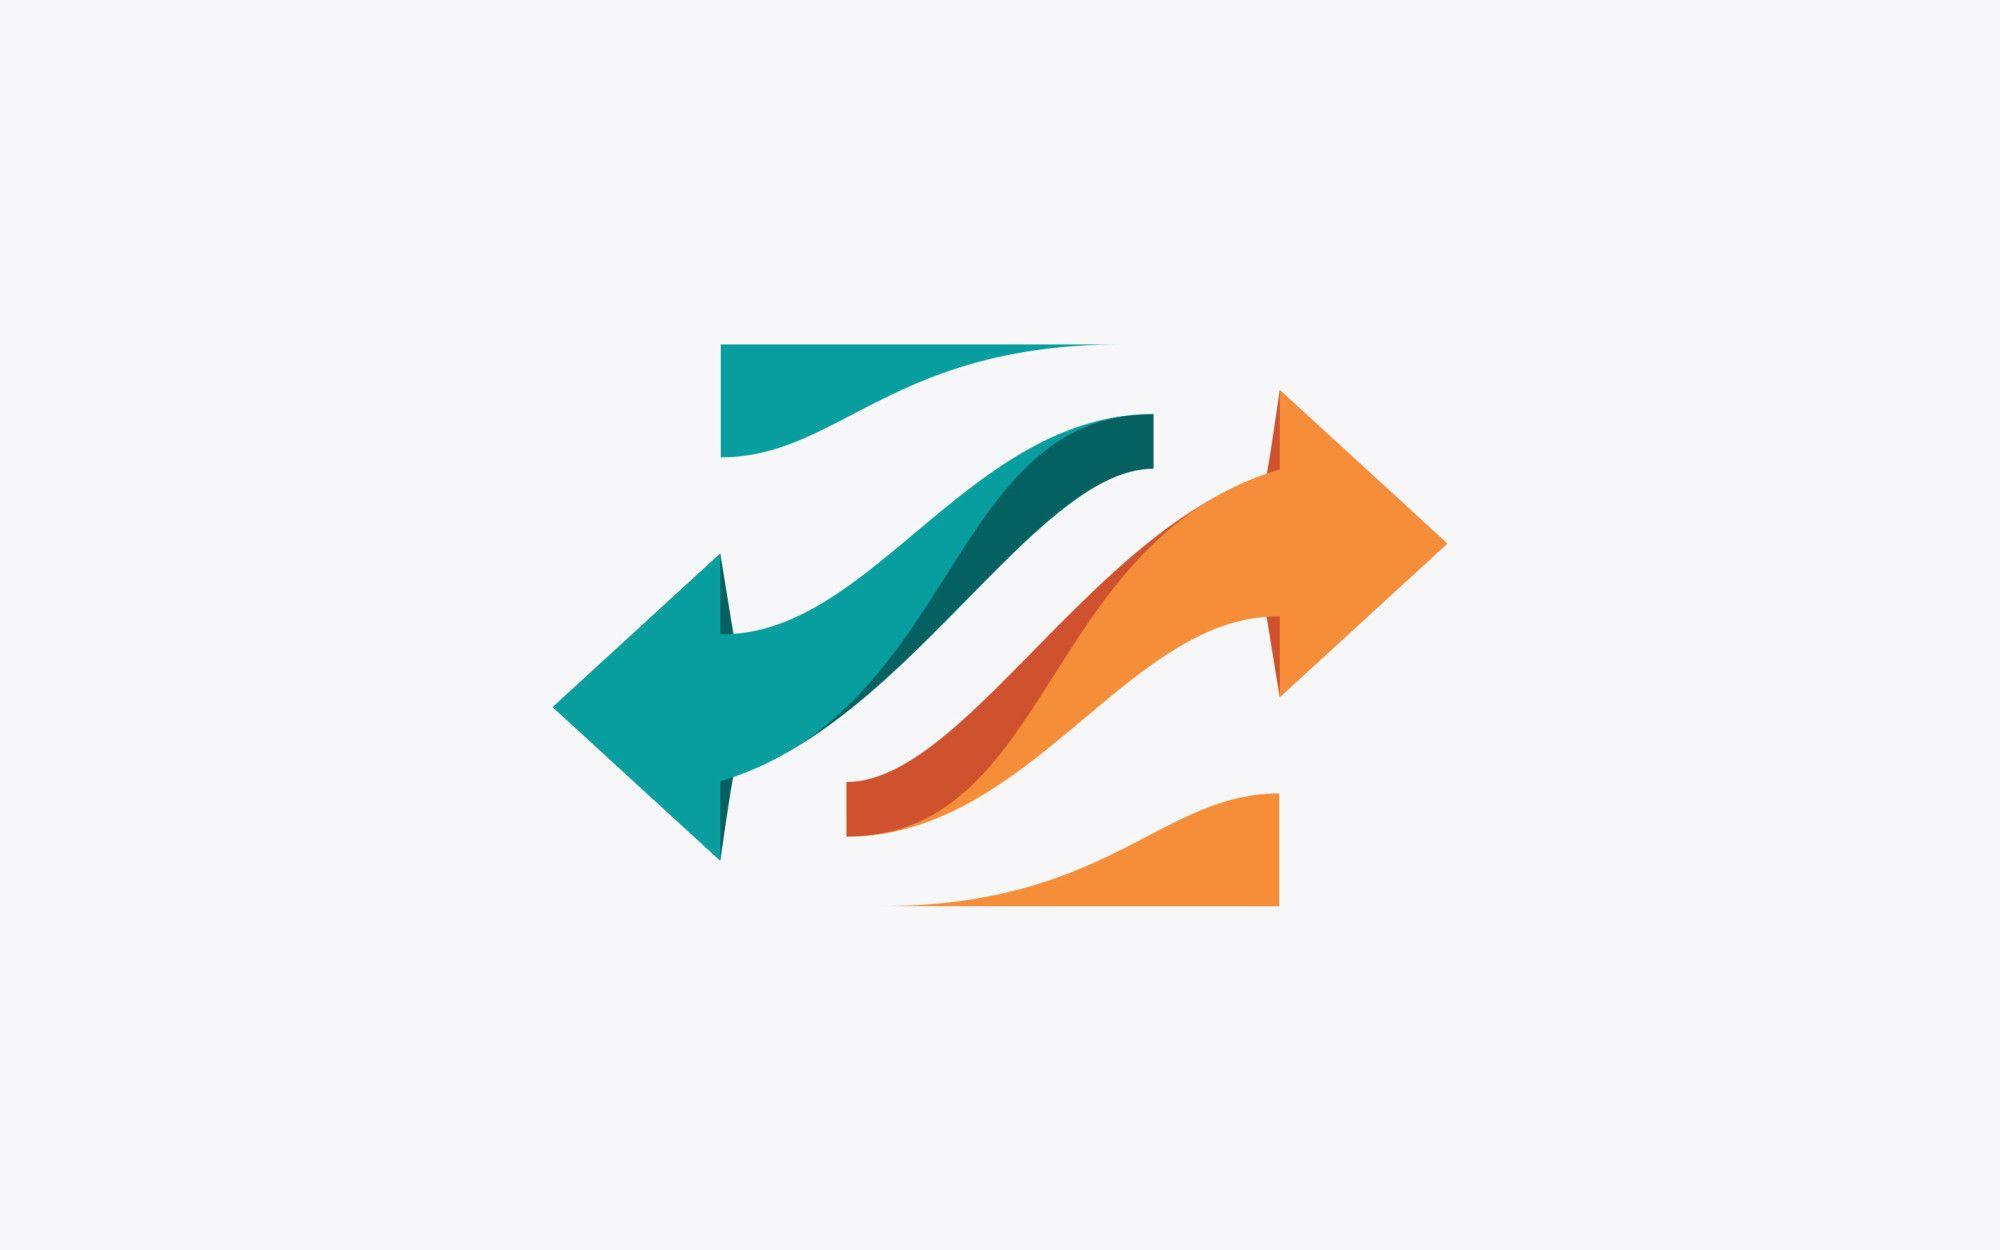 z torrent the evseev design creative logo by theevs pinterest rh pinterest com